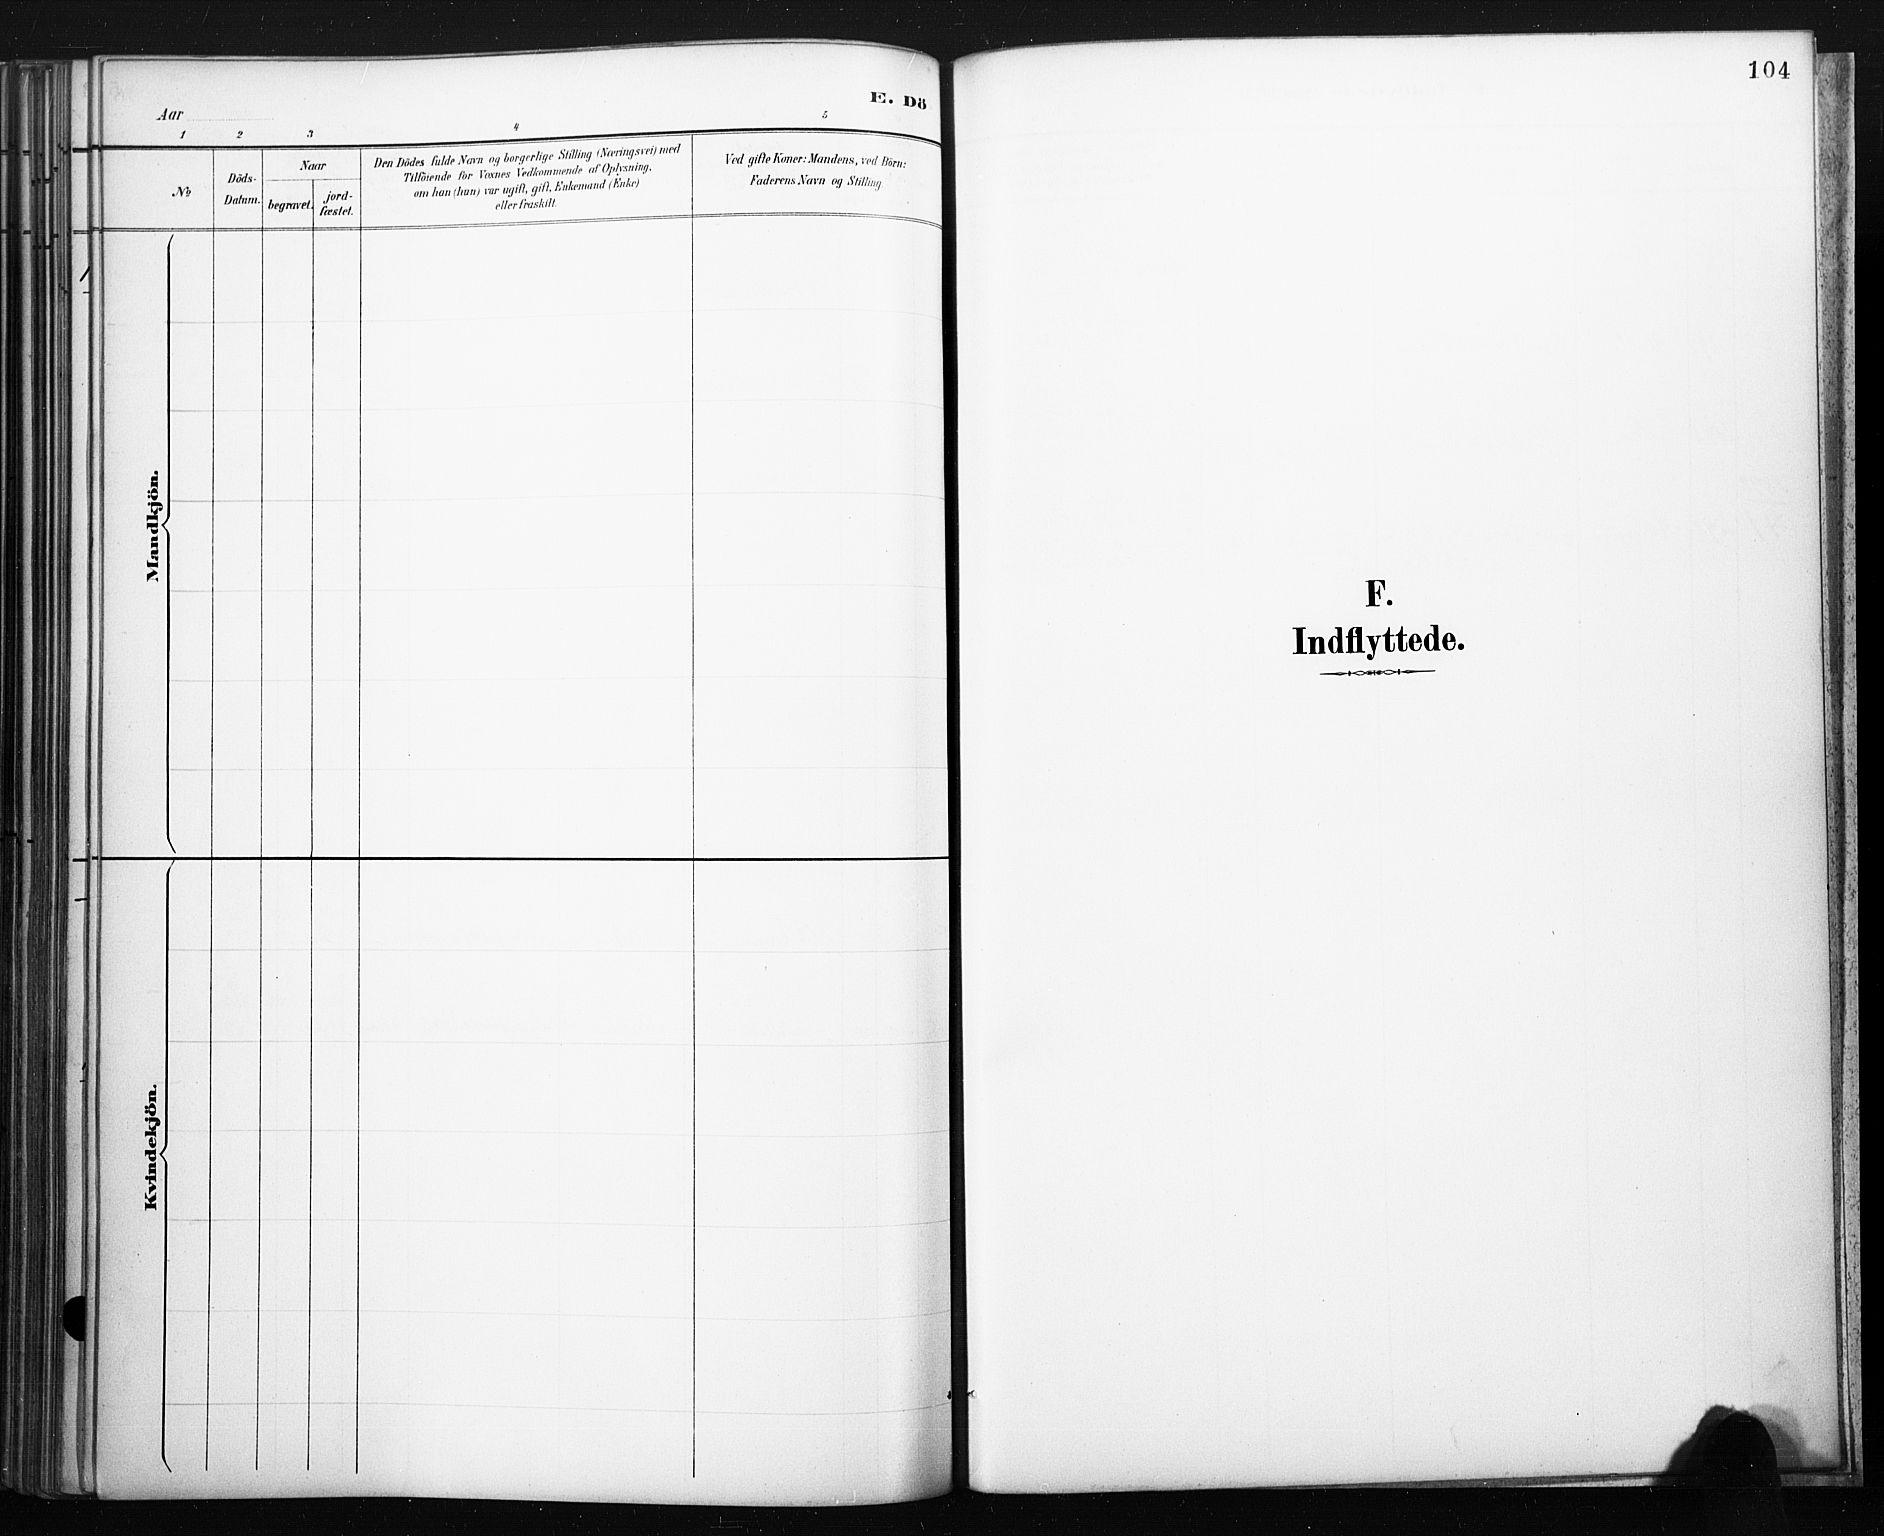 SAKO, Lårdal kirkebøker, F/Fb/L0002: Ministerialbok nr. II 2, 1887-1918, s. 104